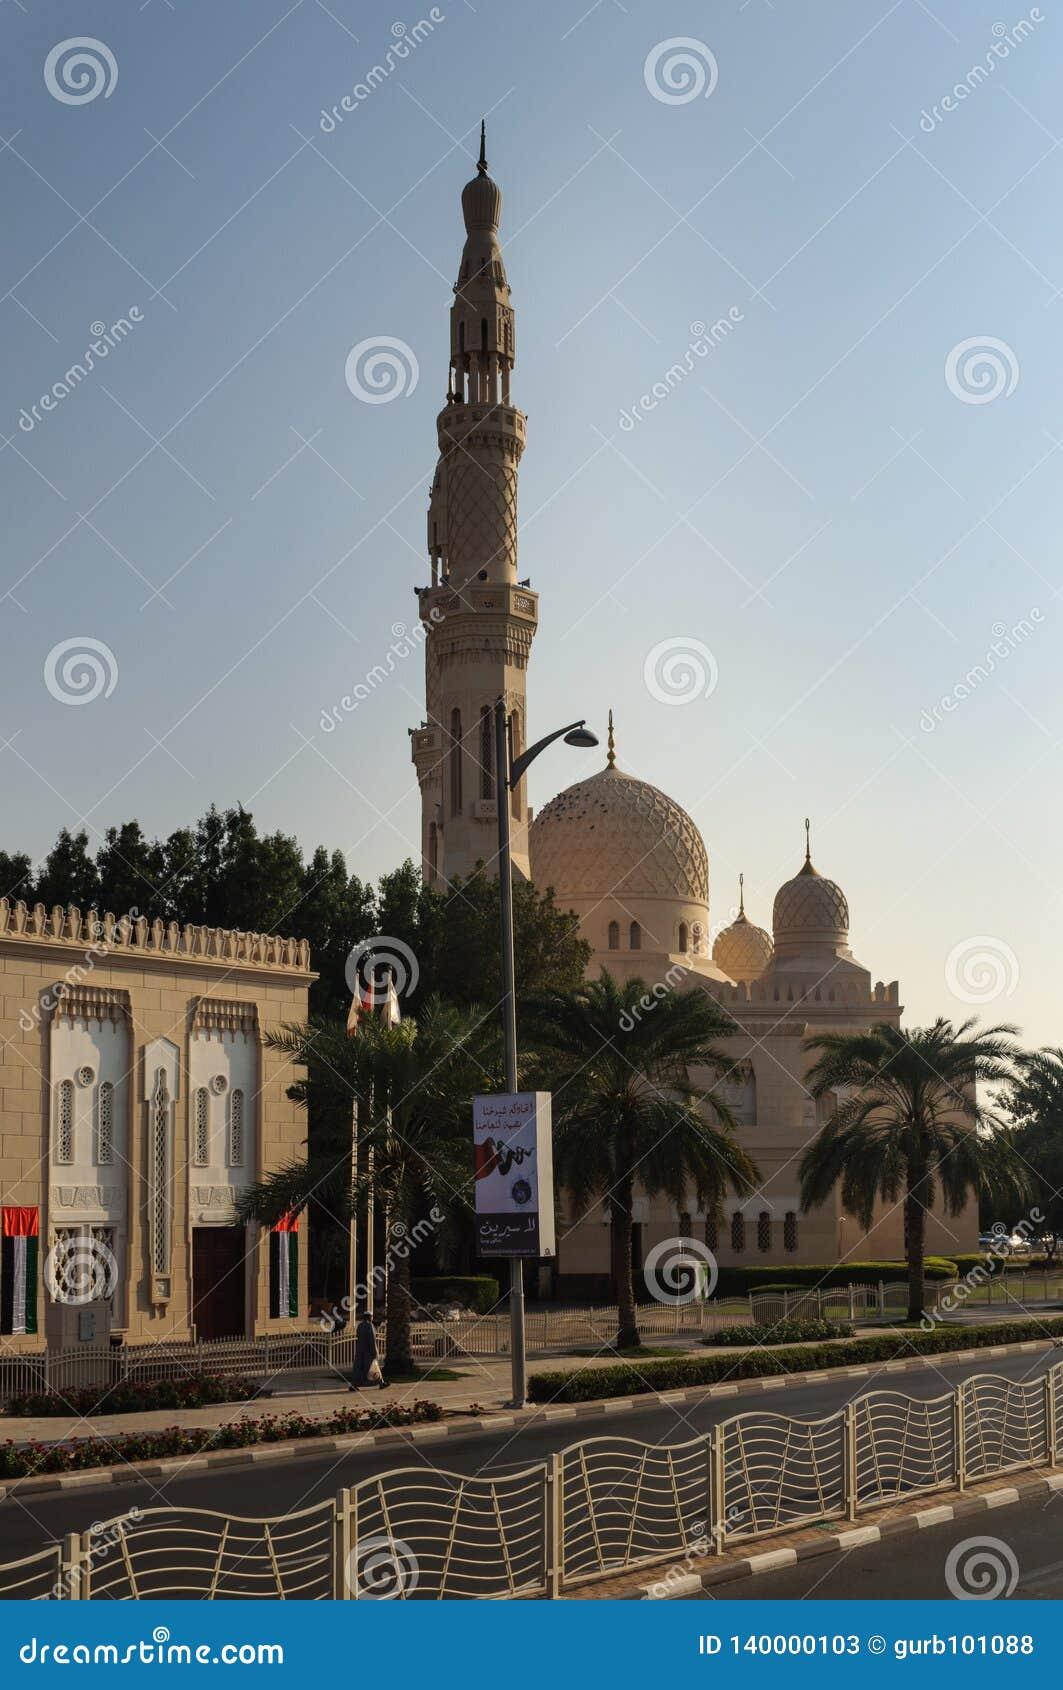 The Jumeirah Mosque, Dubai , UAE Editorial Stock Photo